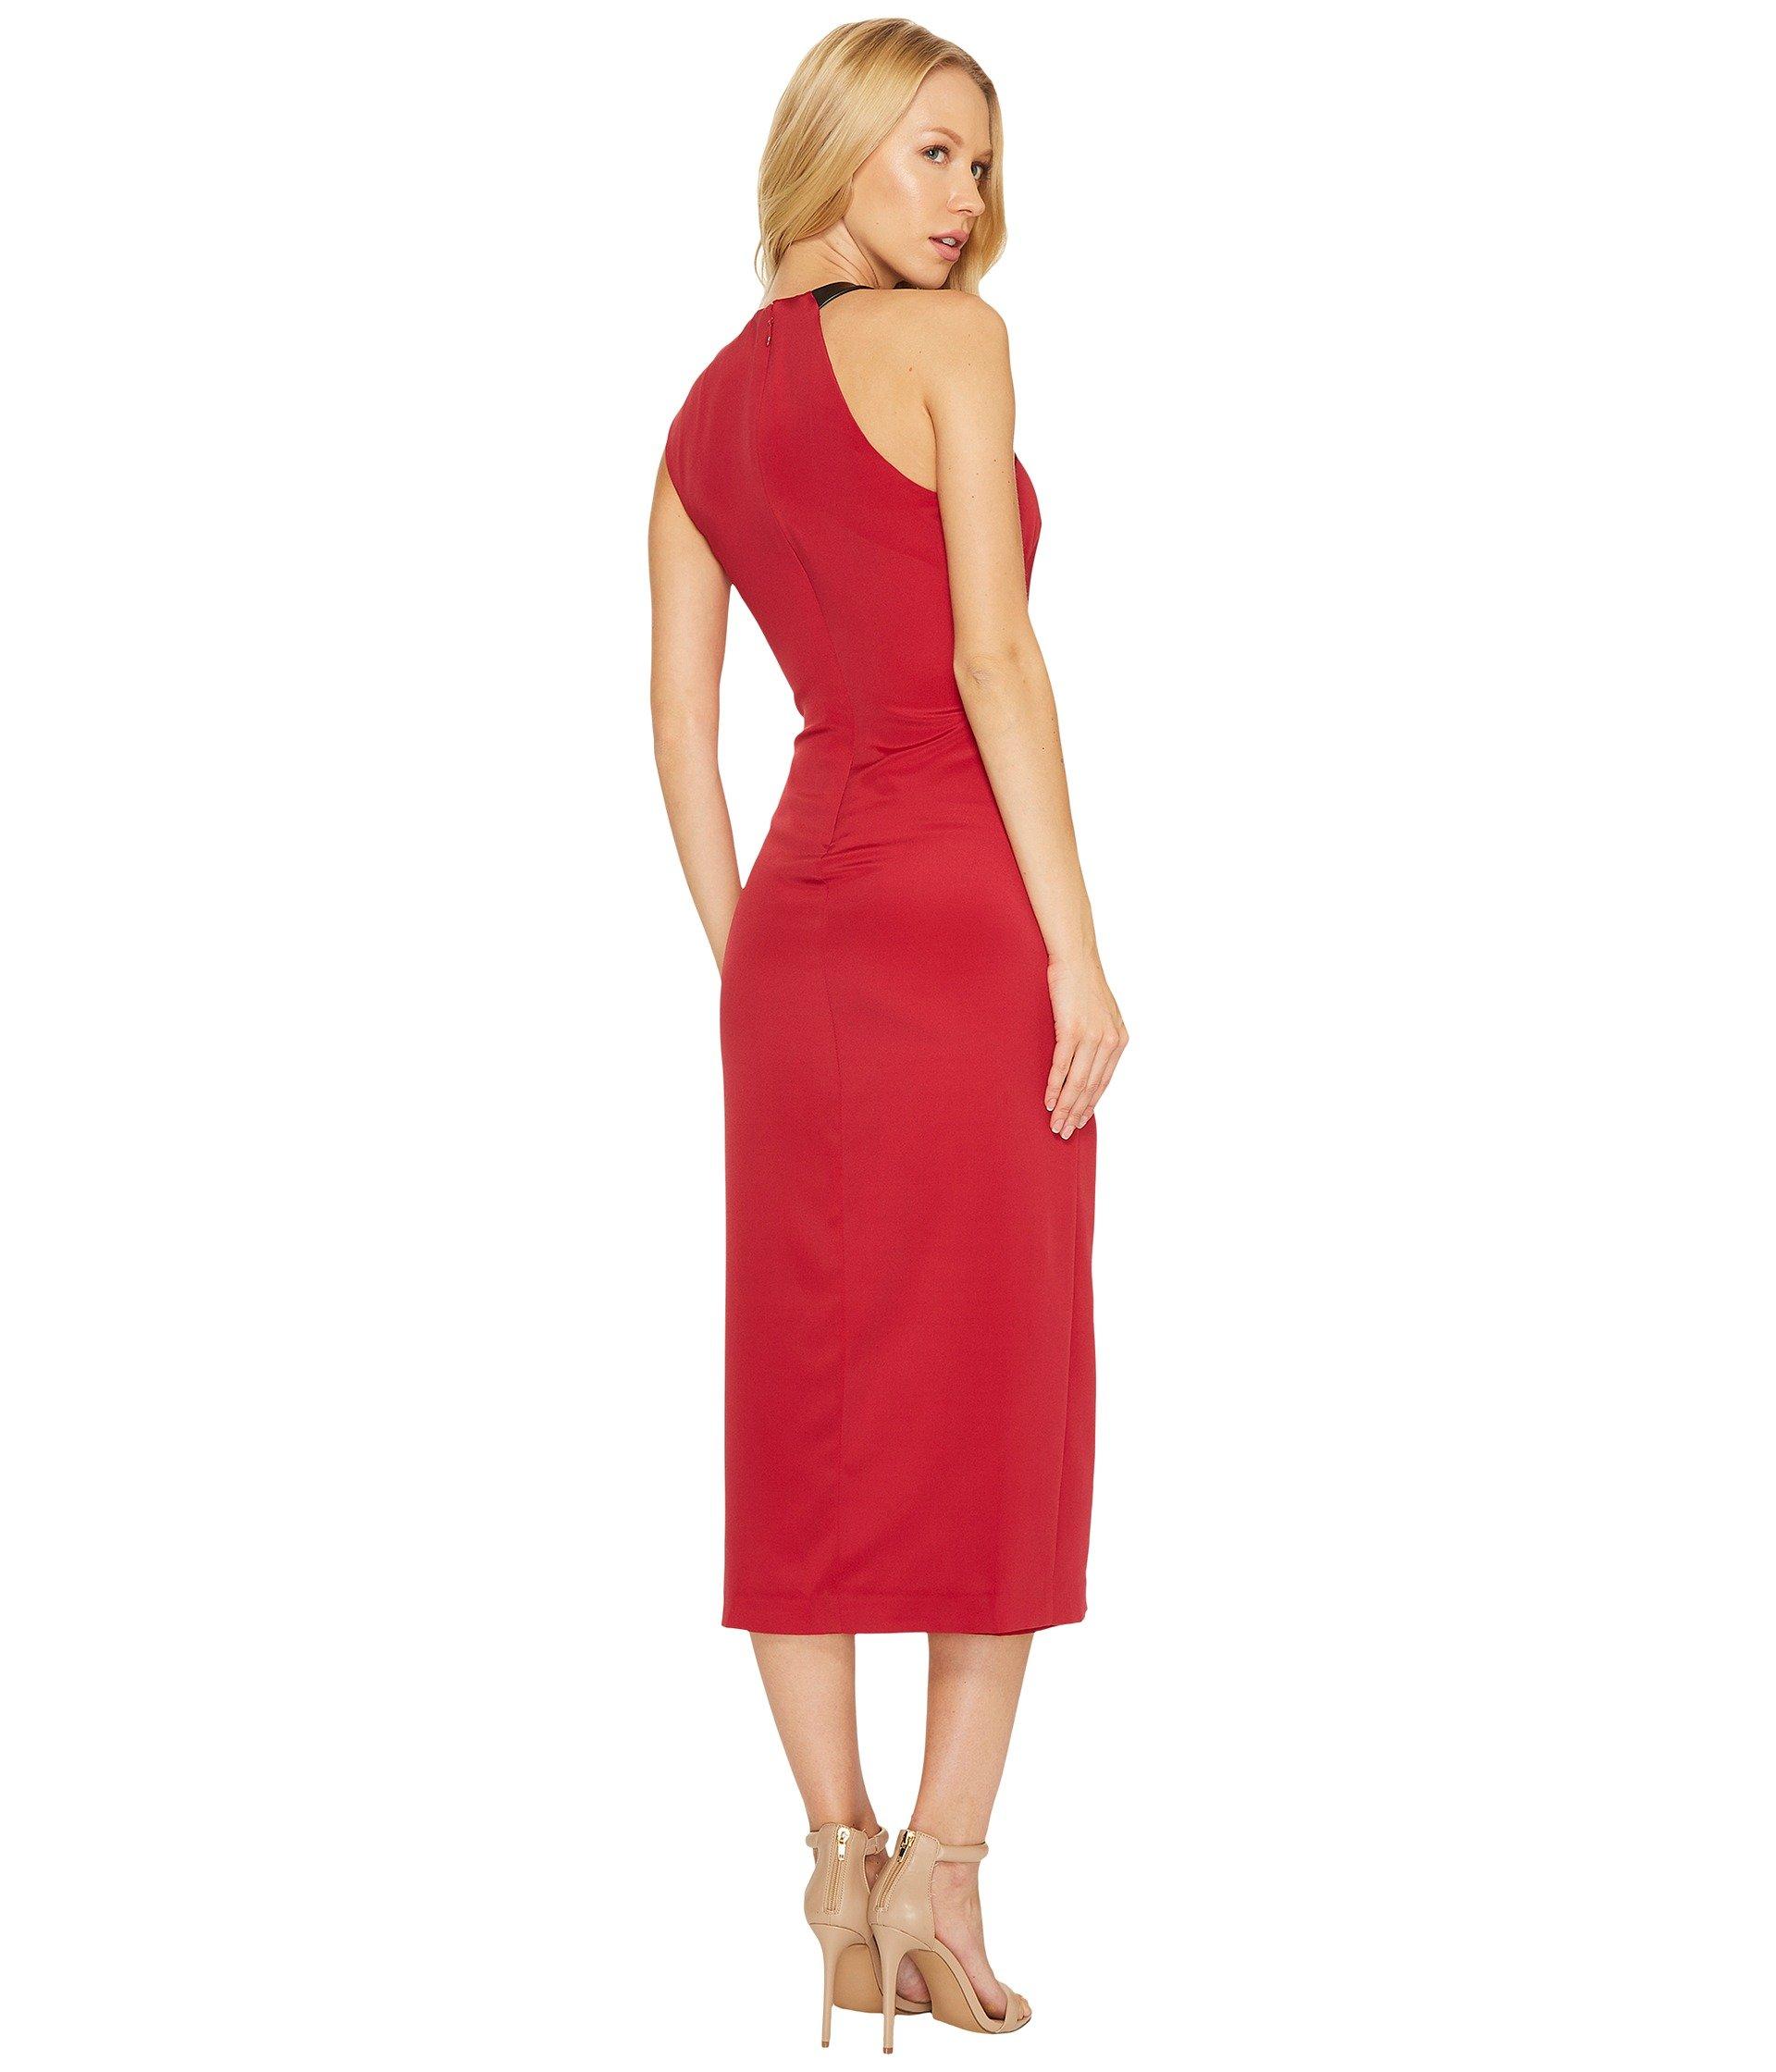 NICOLE MILLER SILK RUCHED DRESS W/ HIGH SLIT, CRIMSON RED   ModeSens